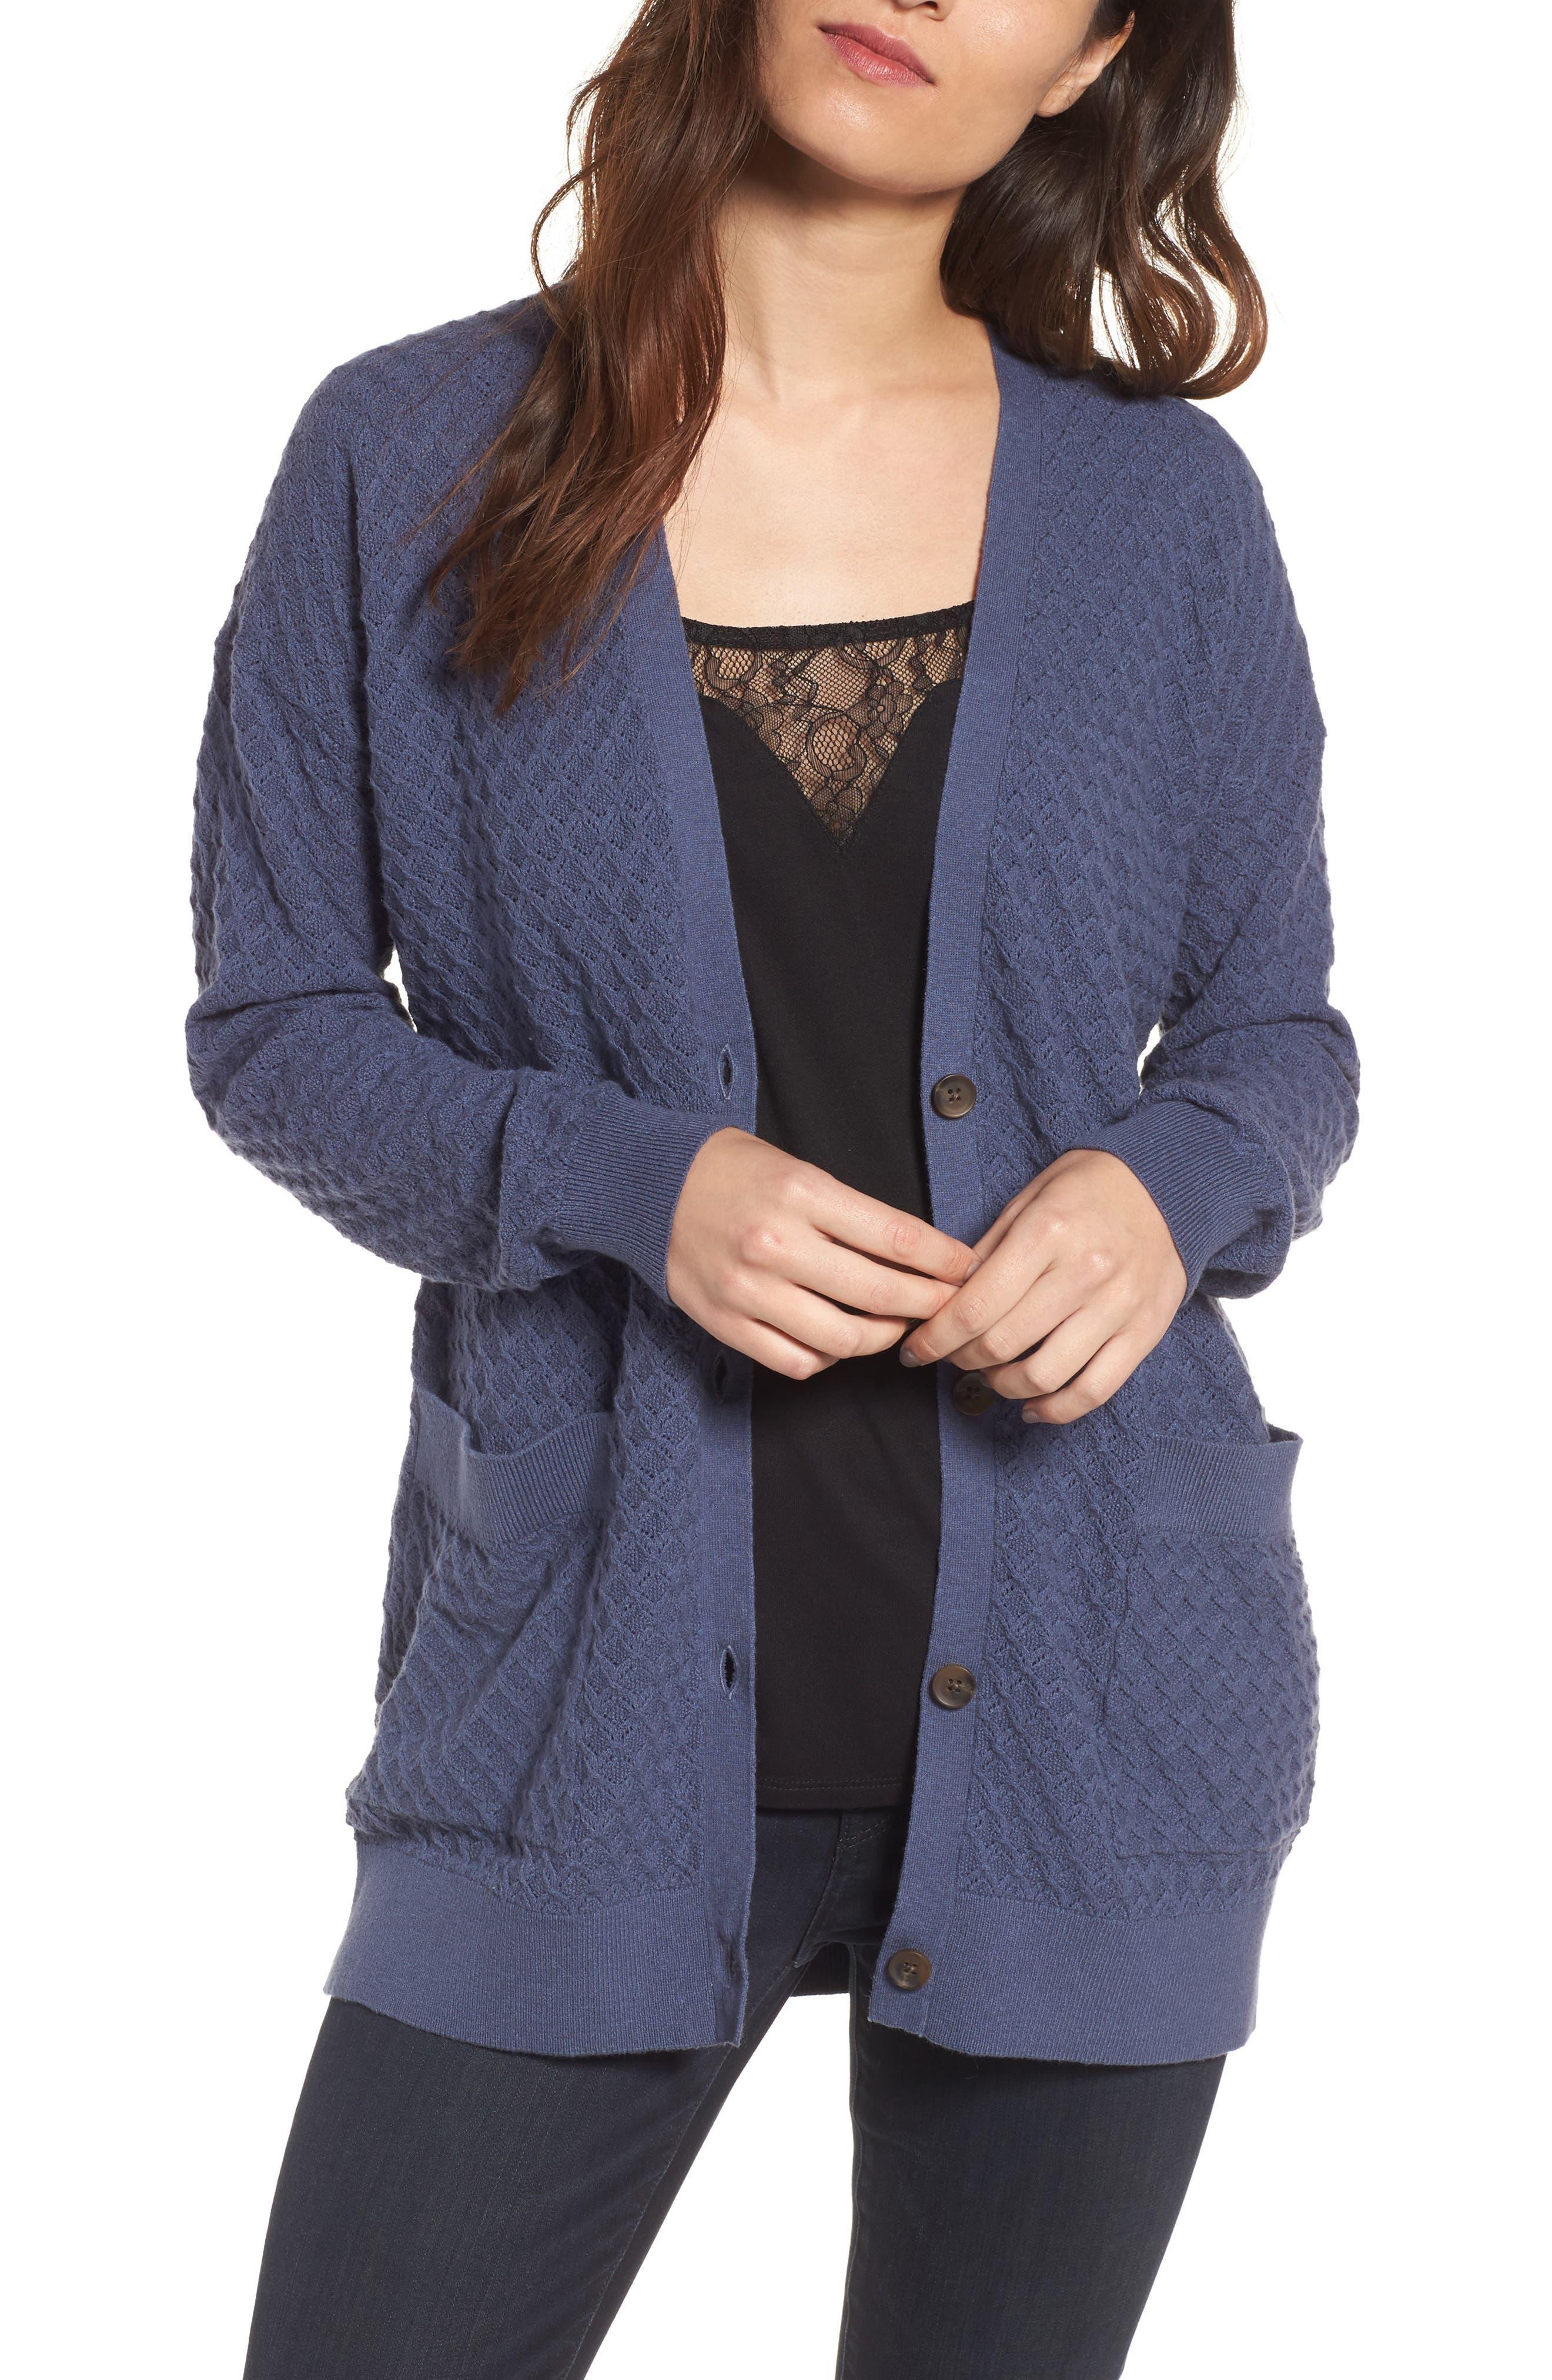 Pointelle Cardigan Sweater,                         Main,                         color, Blue Vintage